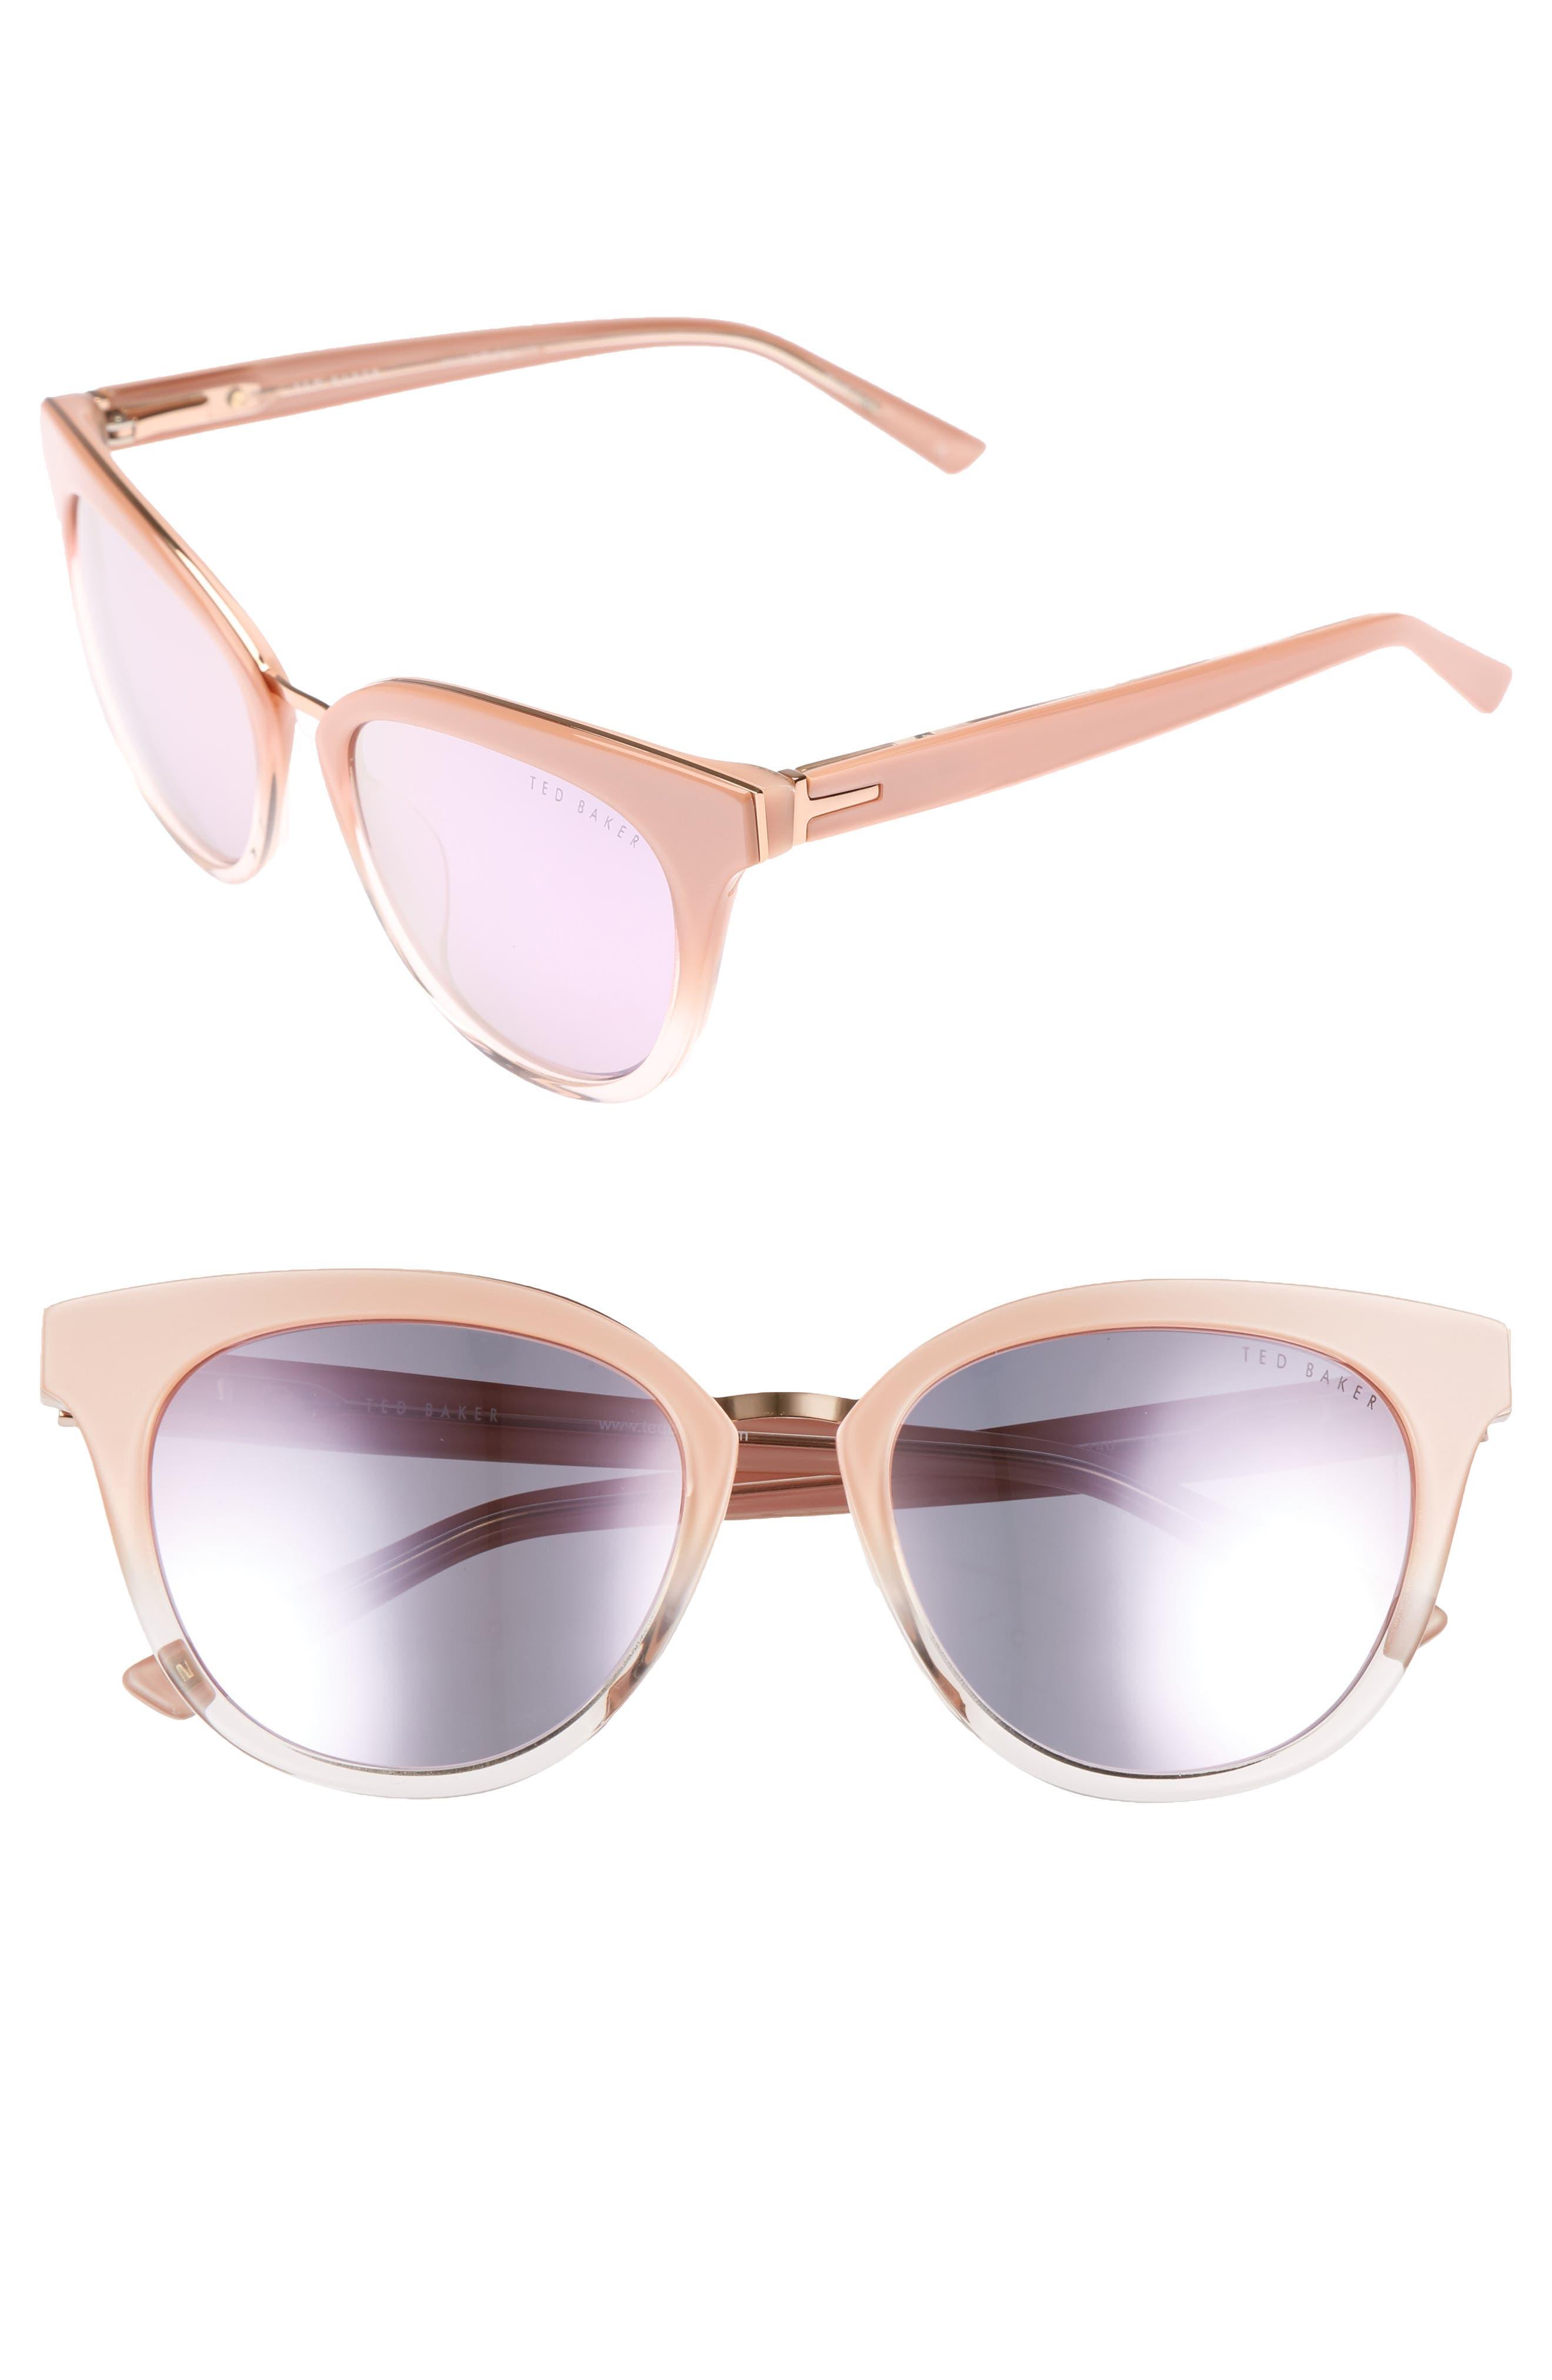 53mm Cat Eye Sunglasses,                             Main thumbnail 1, color,                             Blush